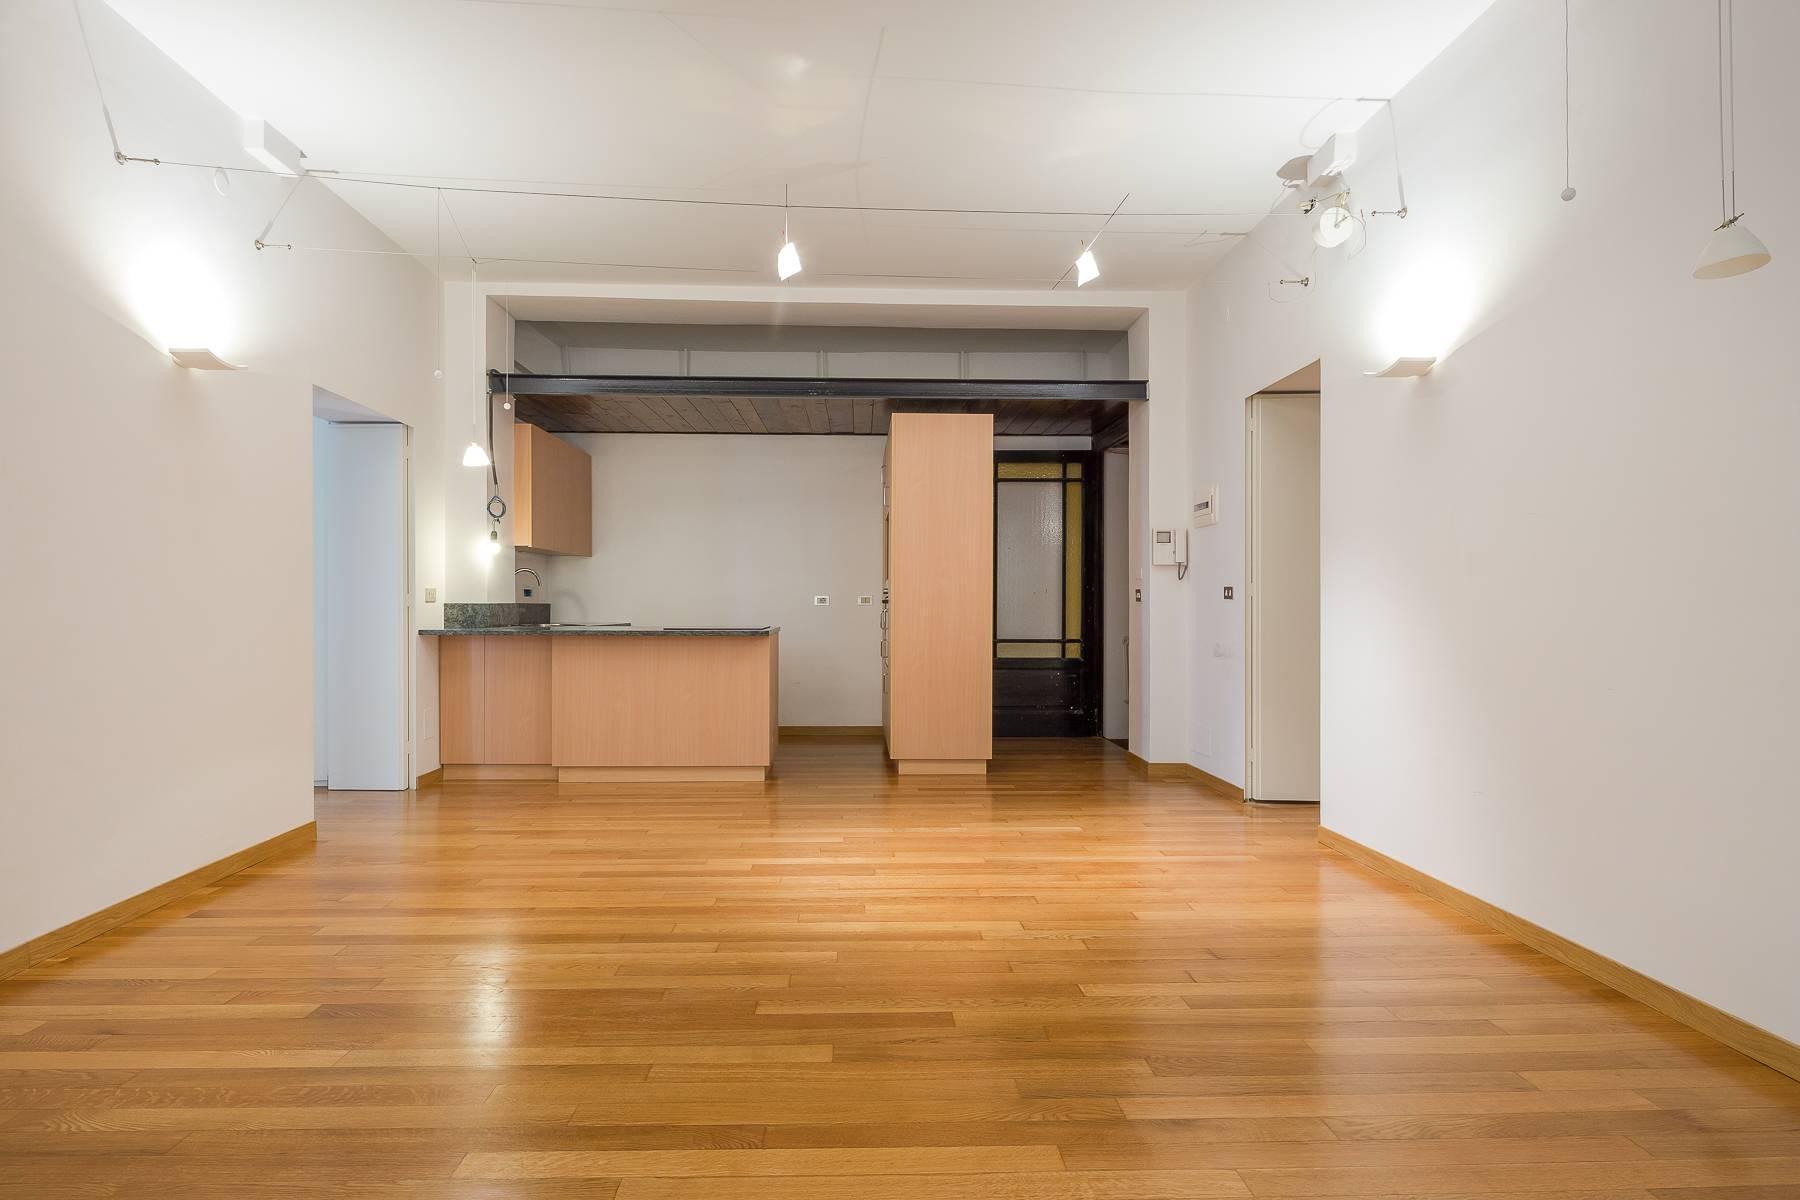 Apartment in an elegant period building located in a prestigious city district - 20